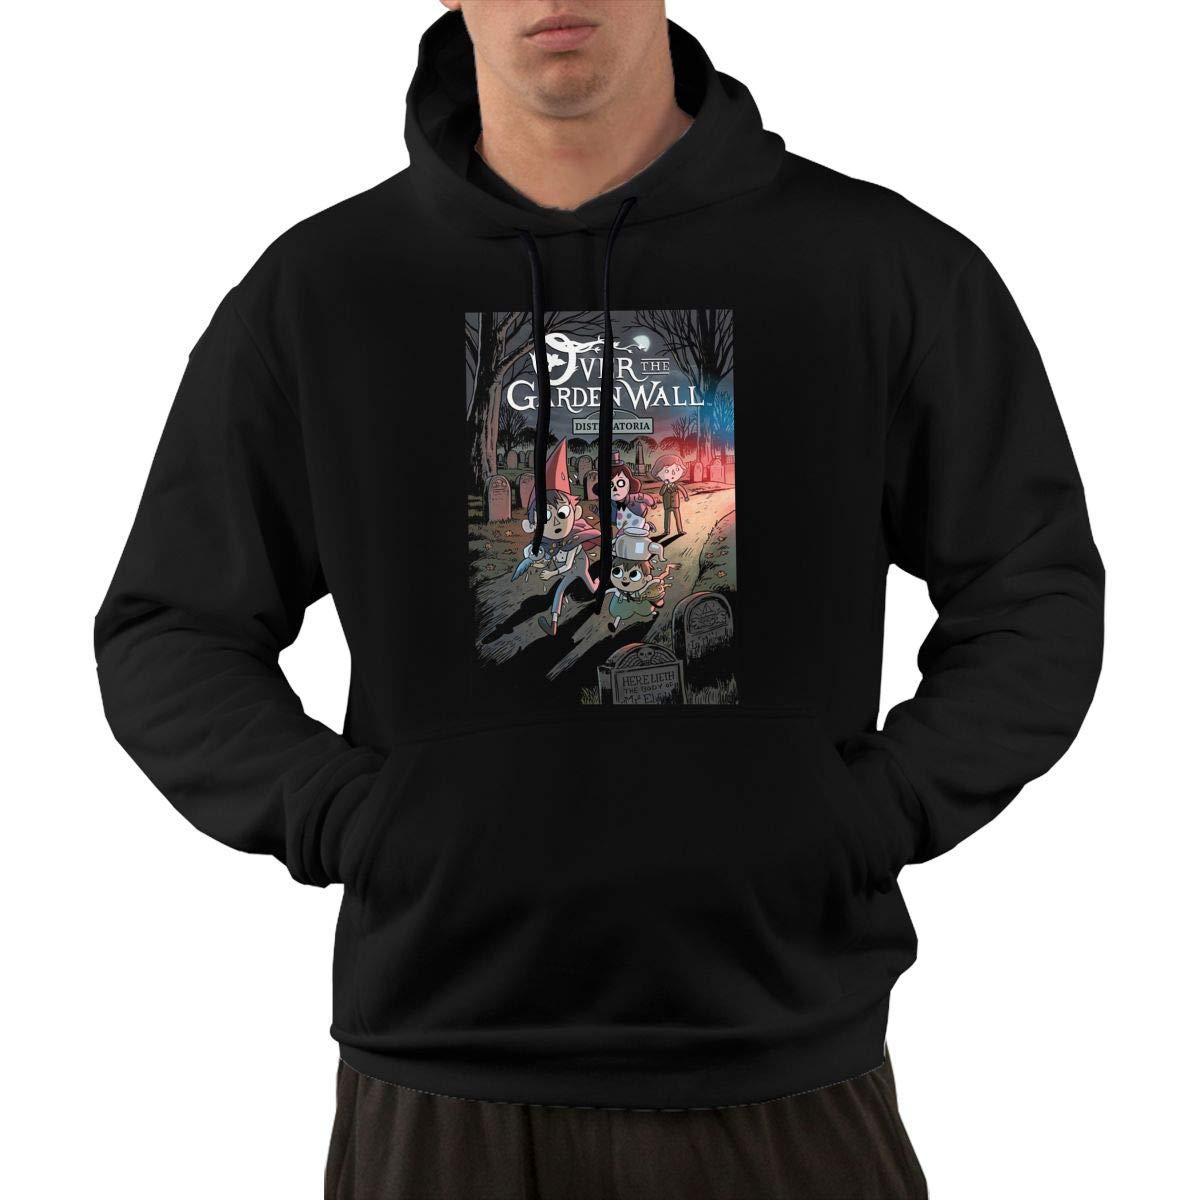 Eowlte Over The Garden Wall Mens Long Sleeve Classic Hoodie Pocket Sweatshirt Black L